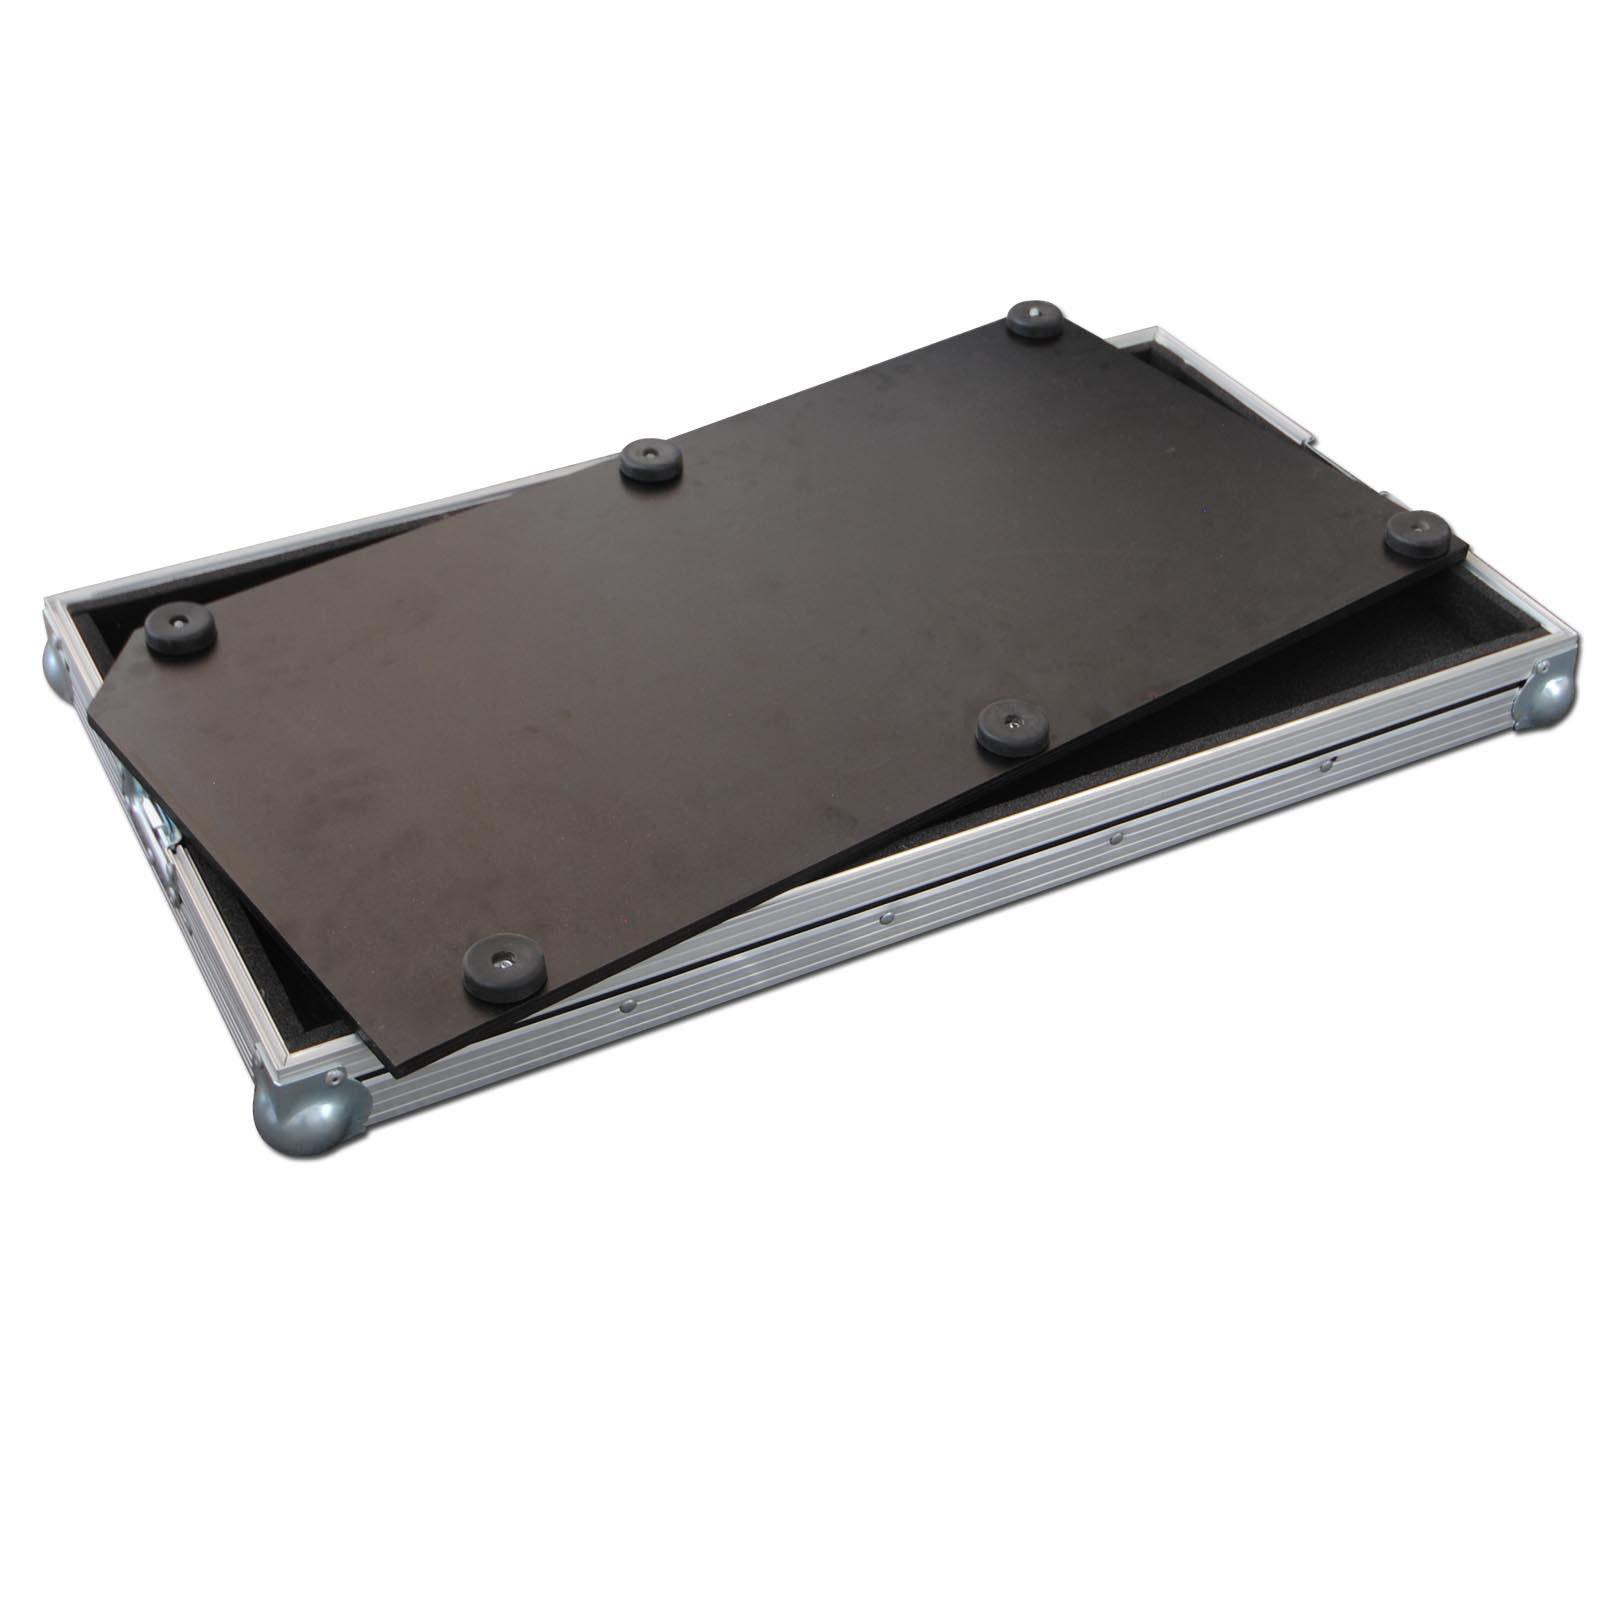 guitar effects pedal board flight case medium. Black Bedroom Furniture Sets. Home Design Ideas